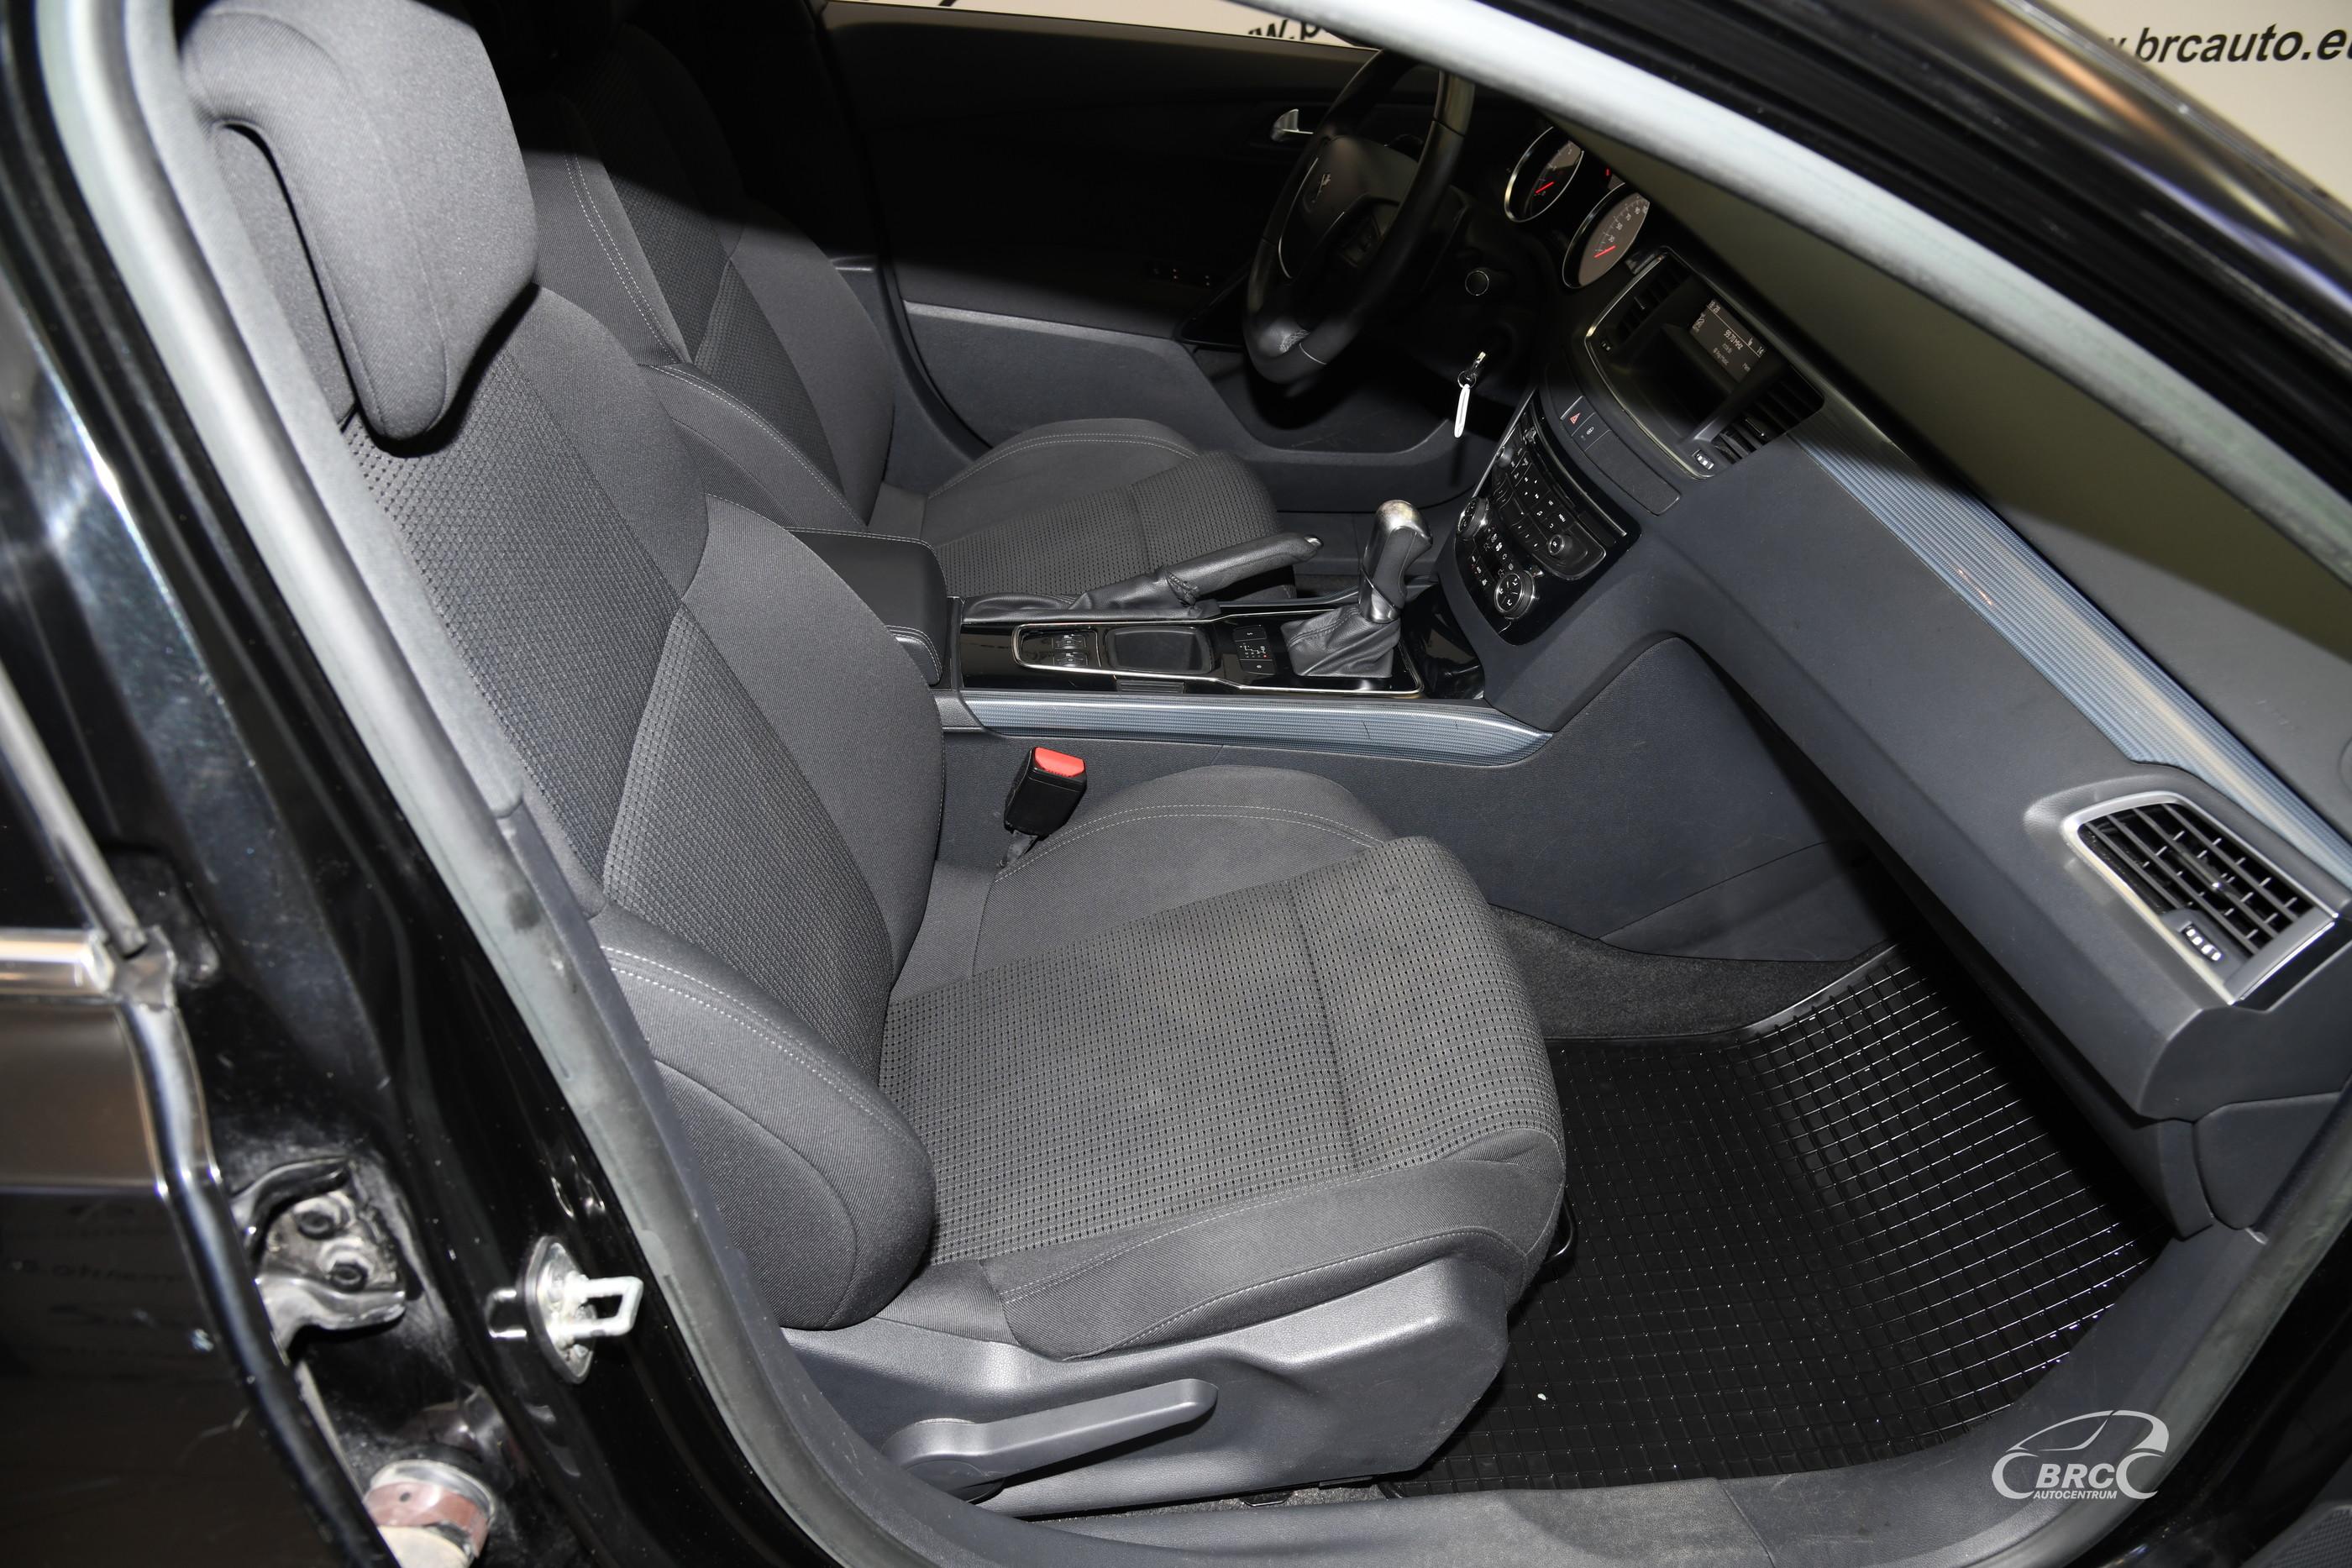 Peugeot 508 2.0 HDi SW Automatas